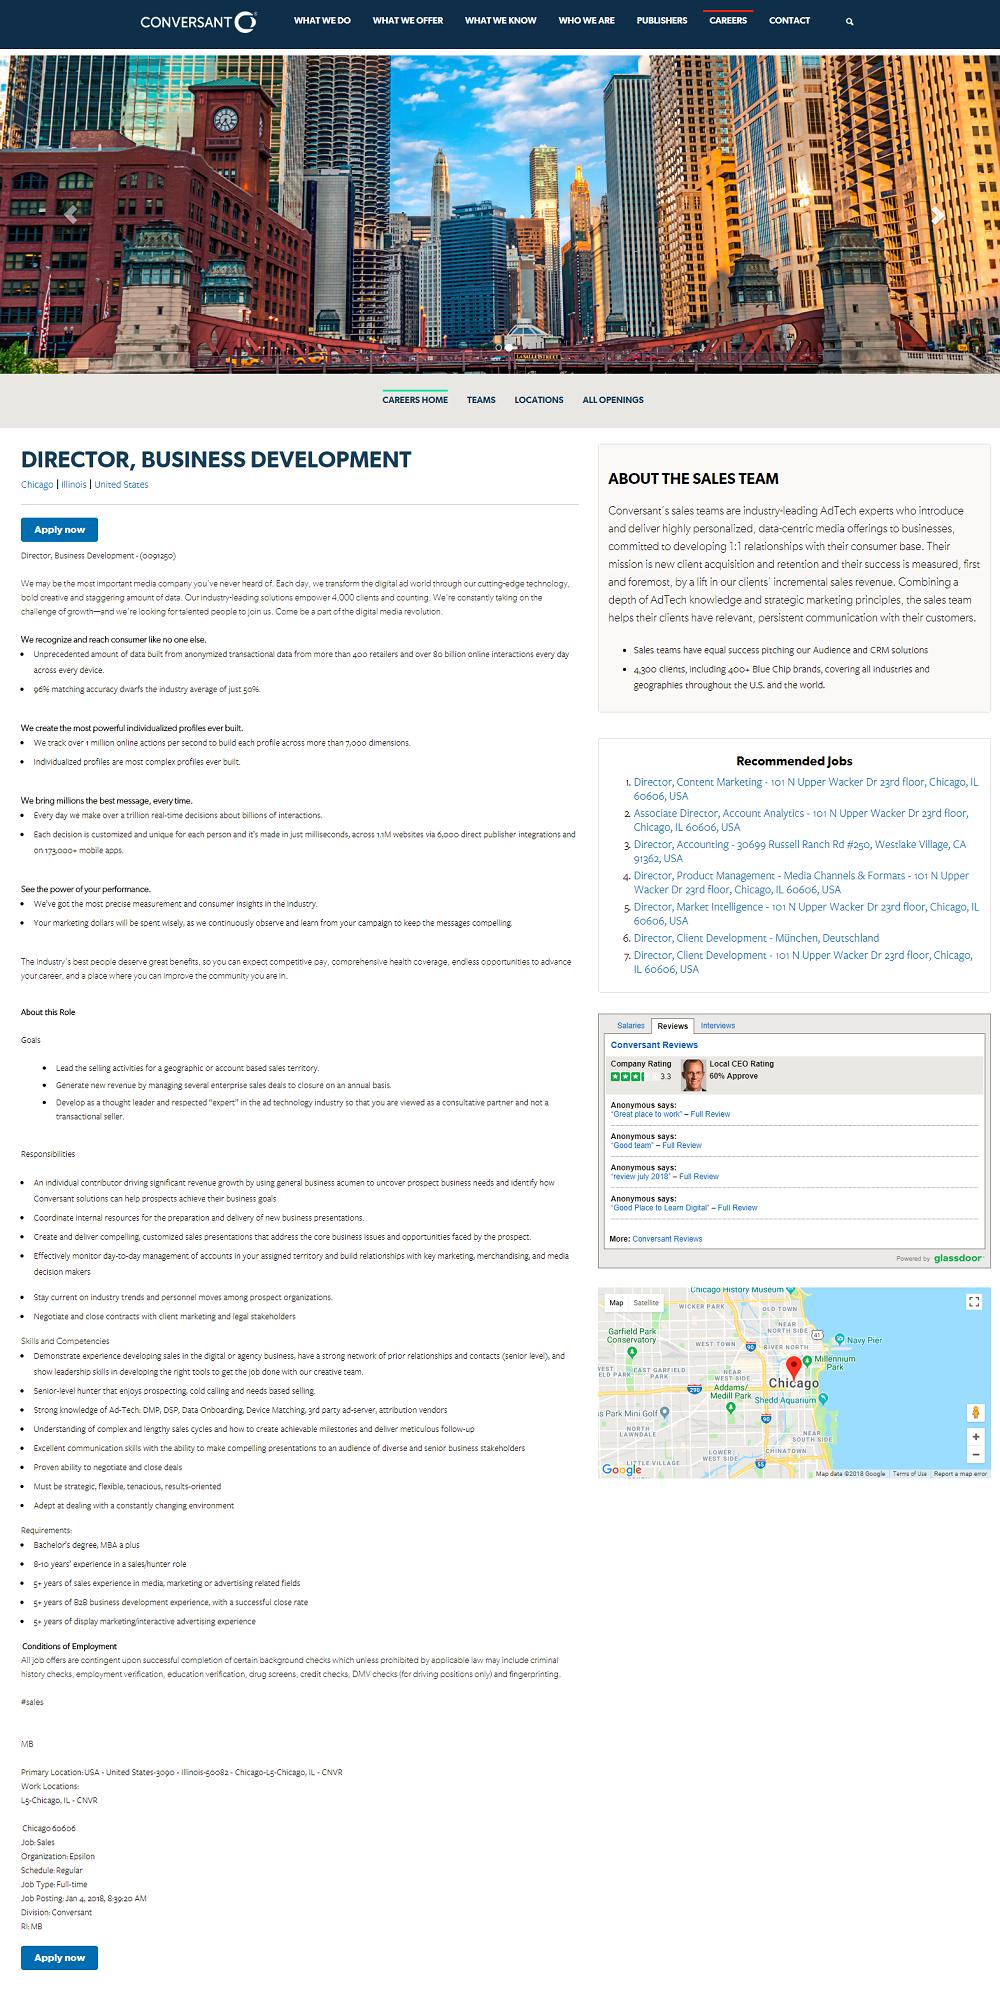 Conversant Job Page Overlay